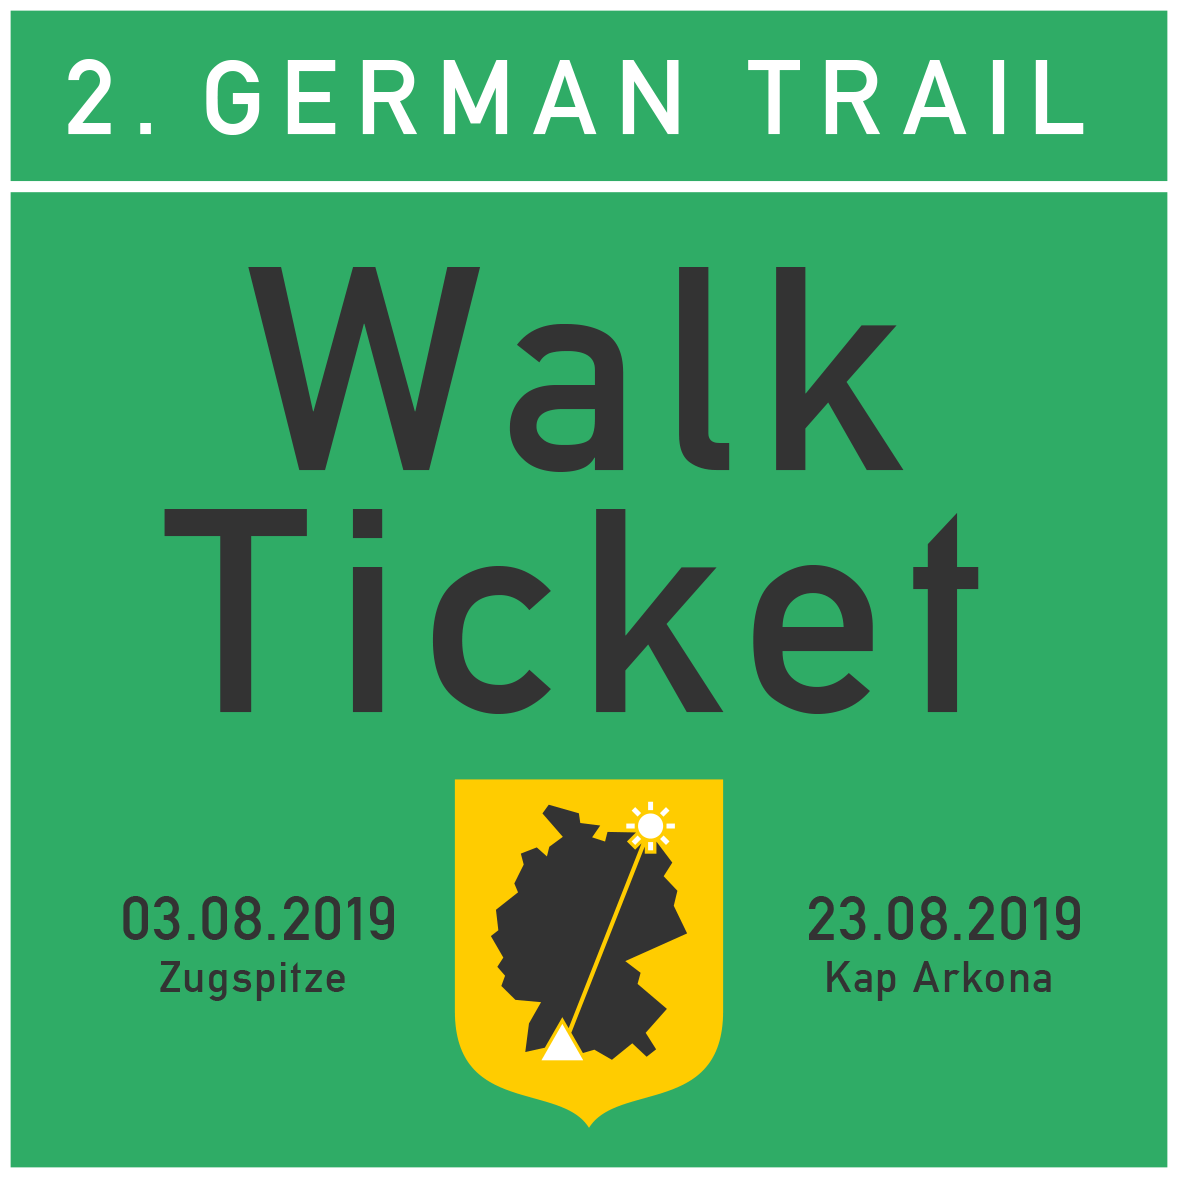 German-Trail-Ticket